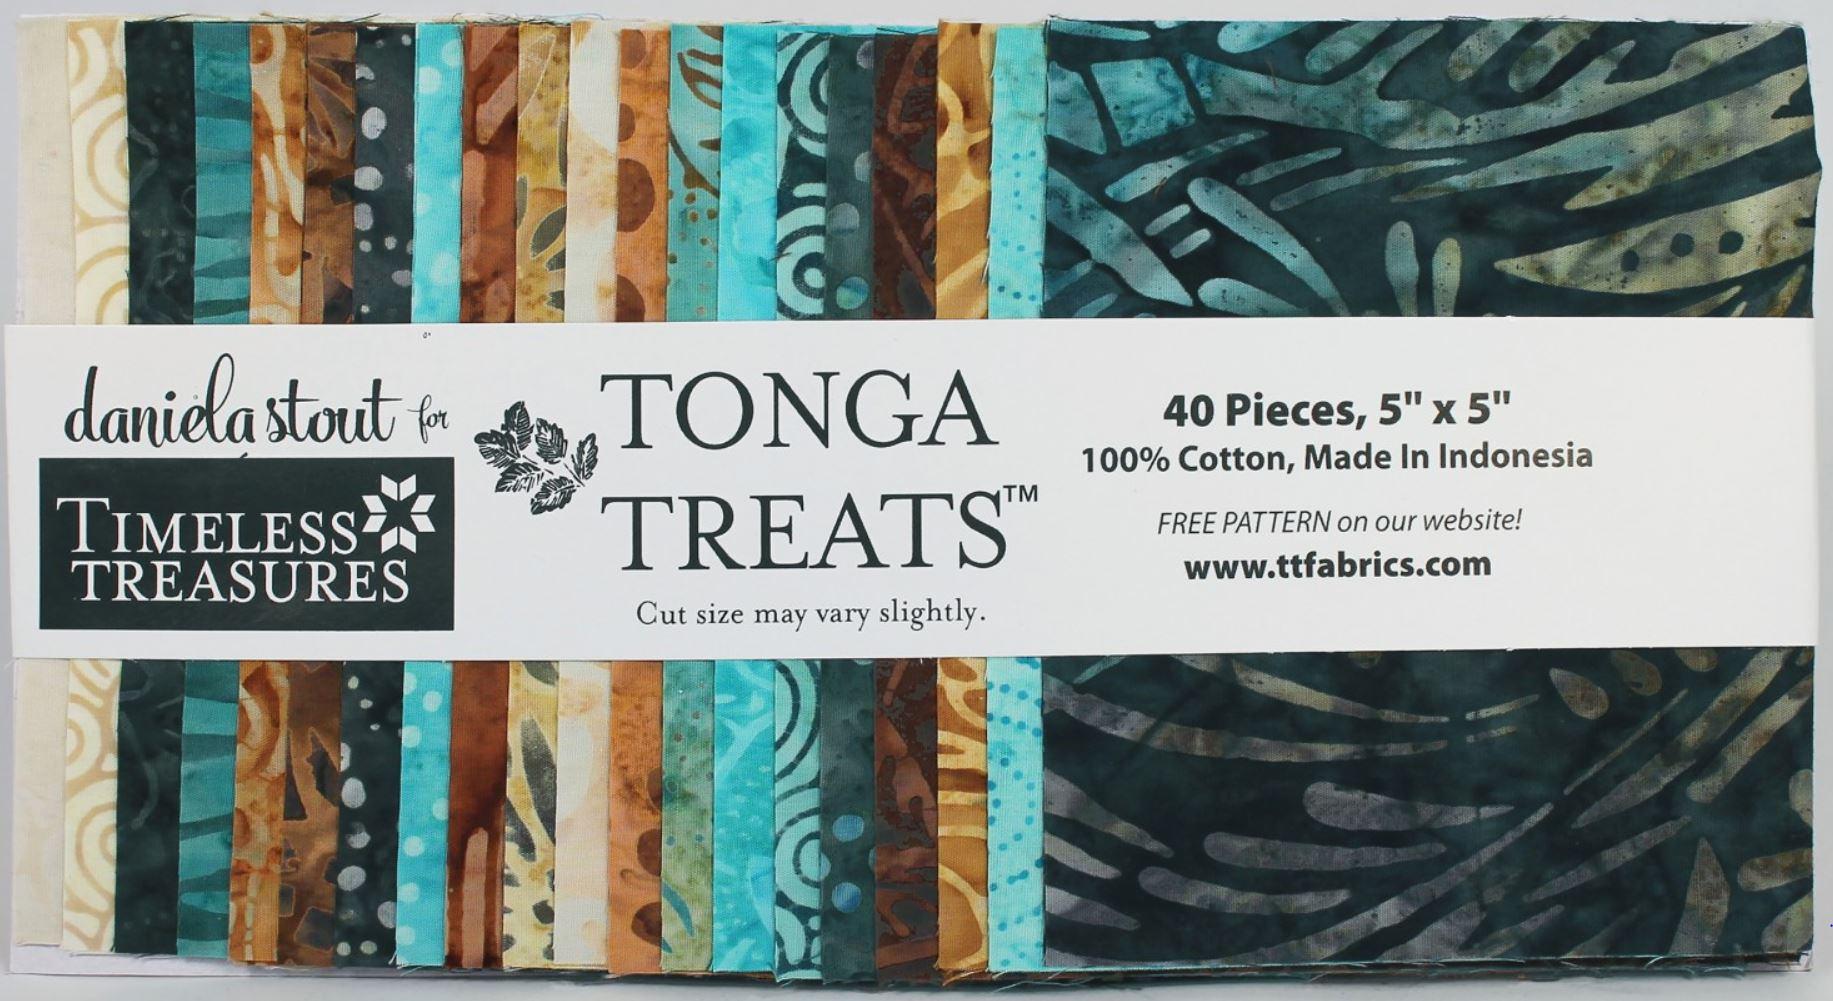 Tonga Treats True Love 5 square batiks - 40 pieces